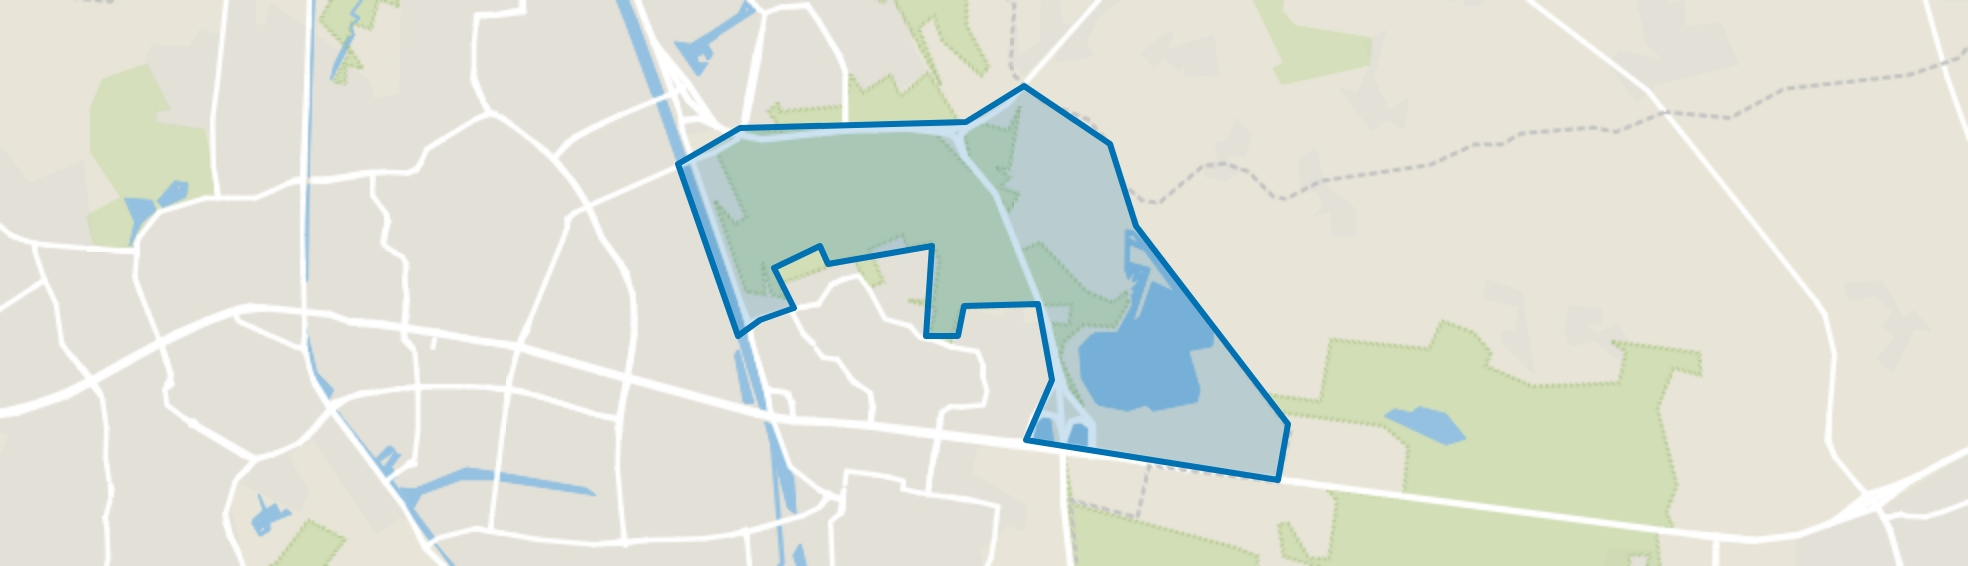 Berkendonk, Helmond map